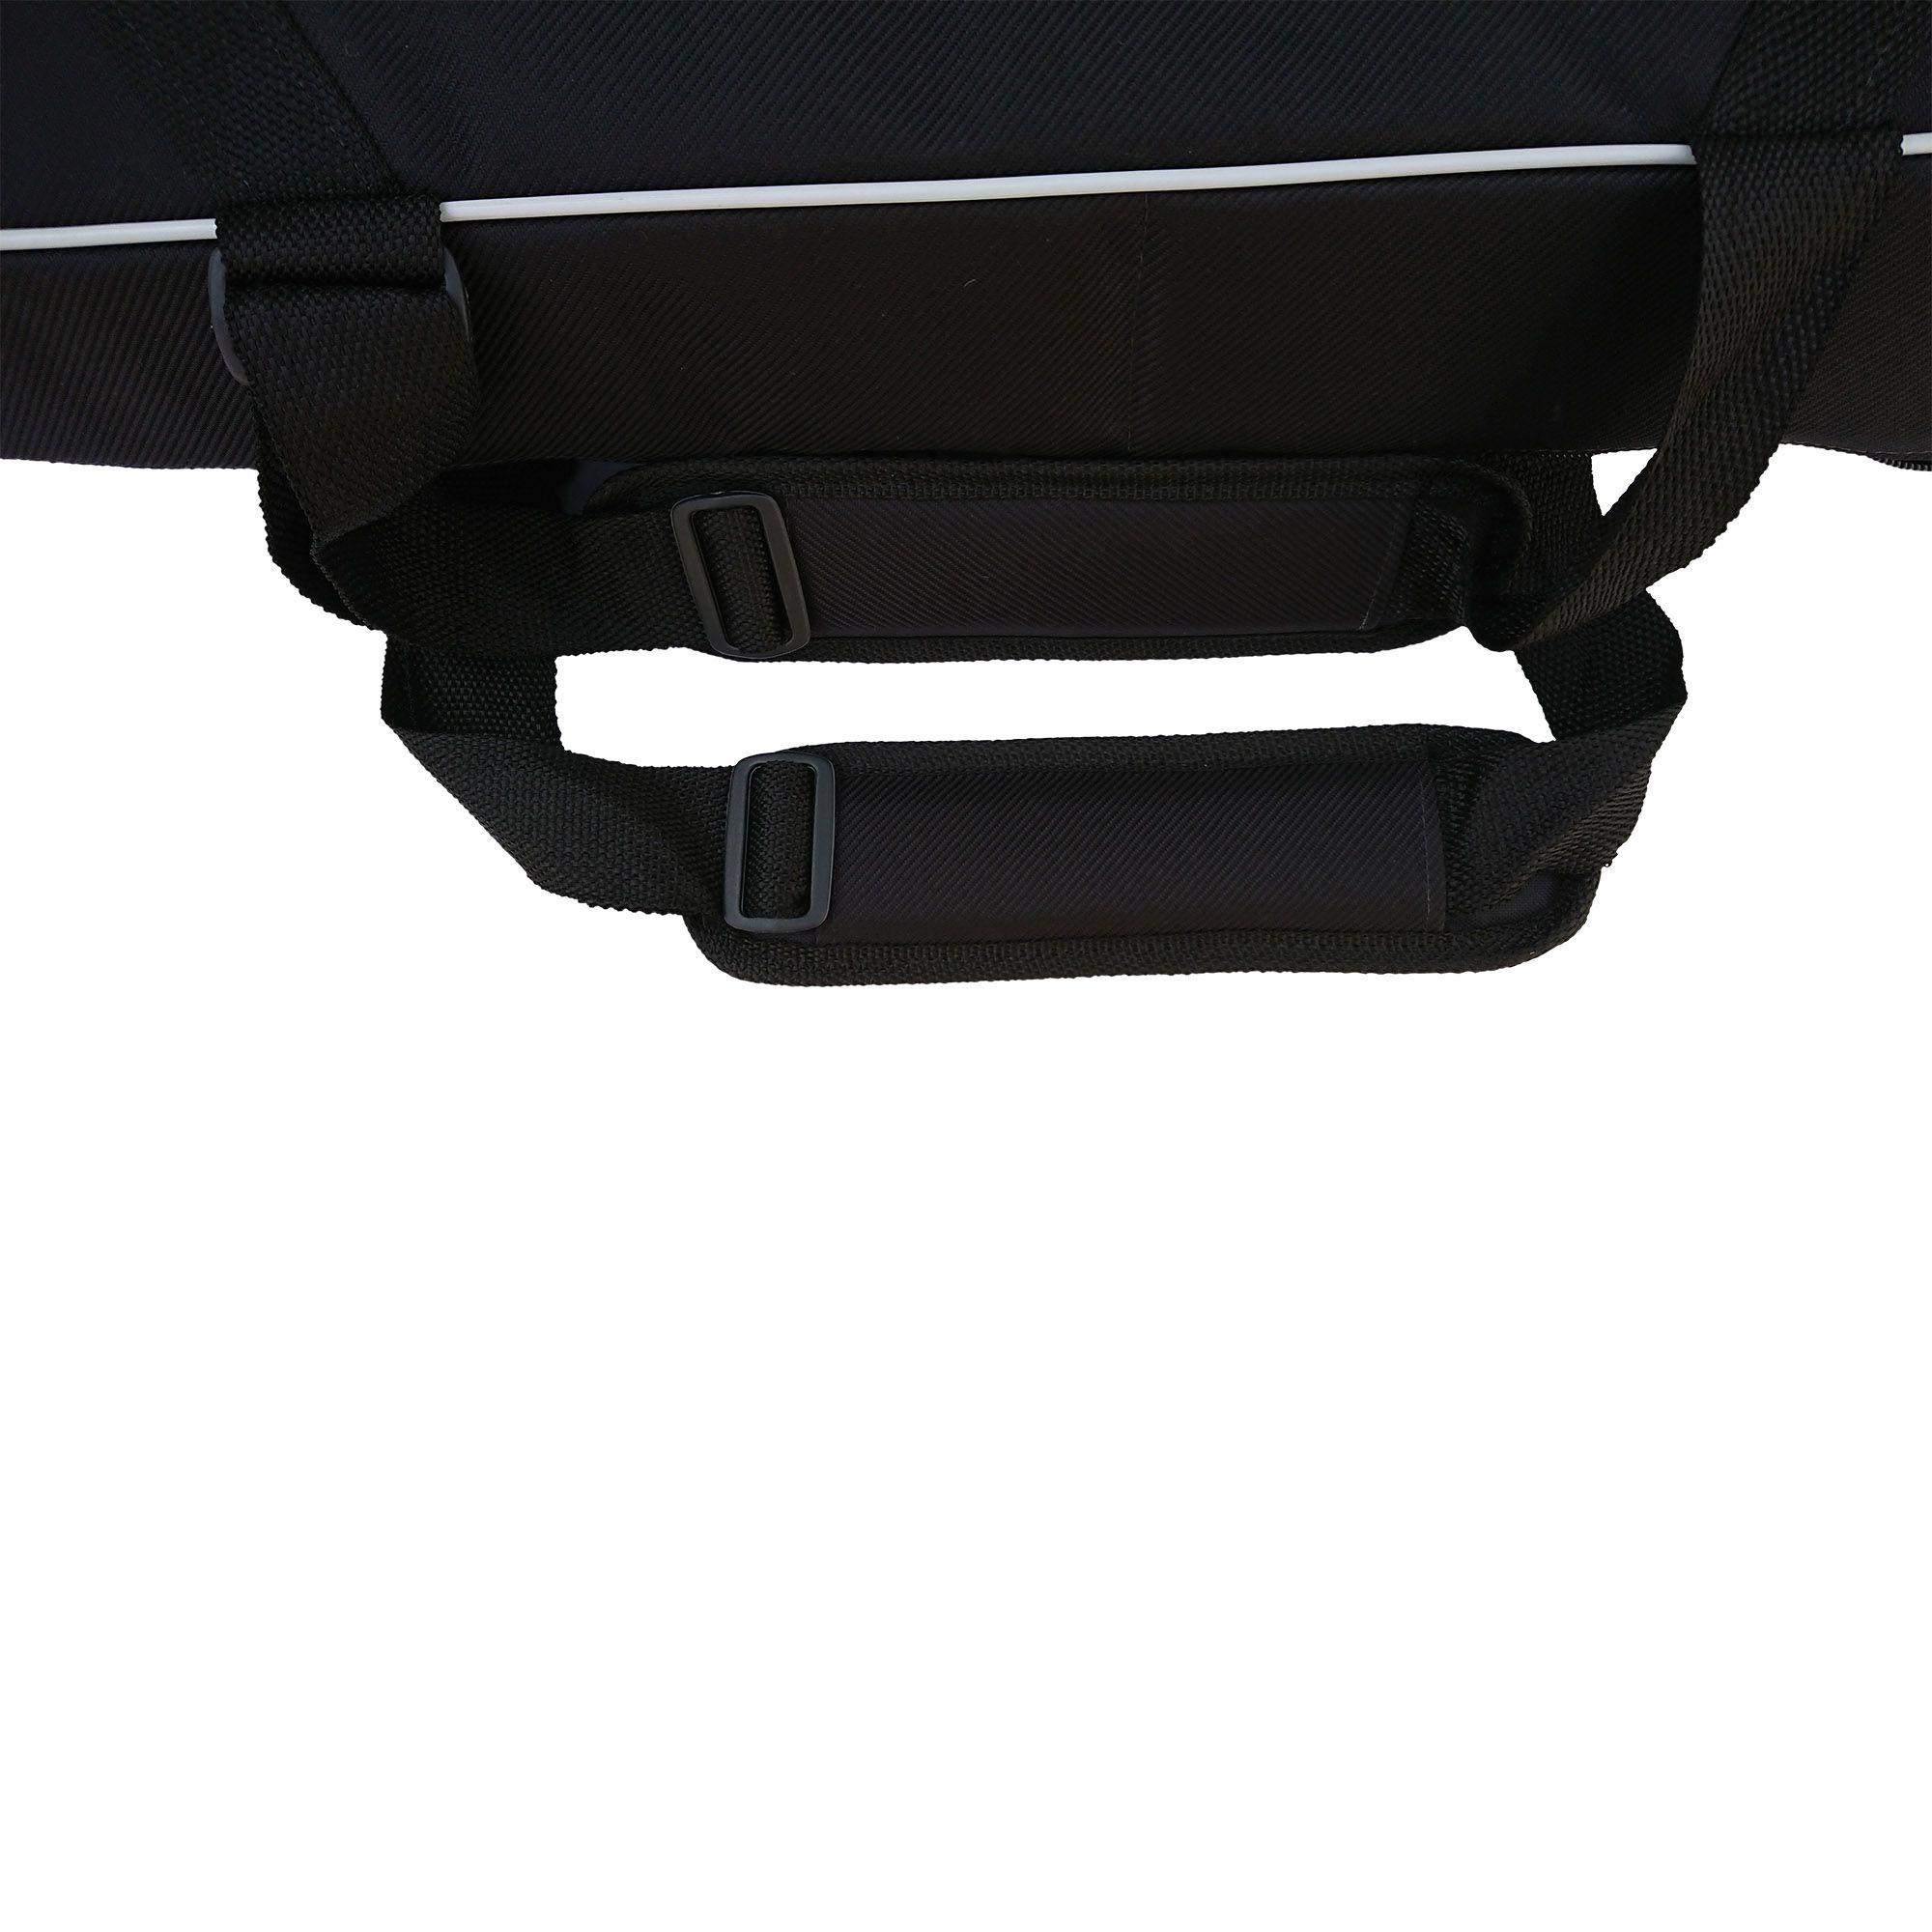 Capa Bag para Teclado SEMI CASE Premium (126 x 37 x 13 cm) Juno-Stage, Jupter 50, Motif XS7 e outros